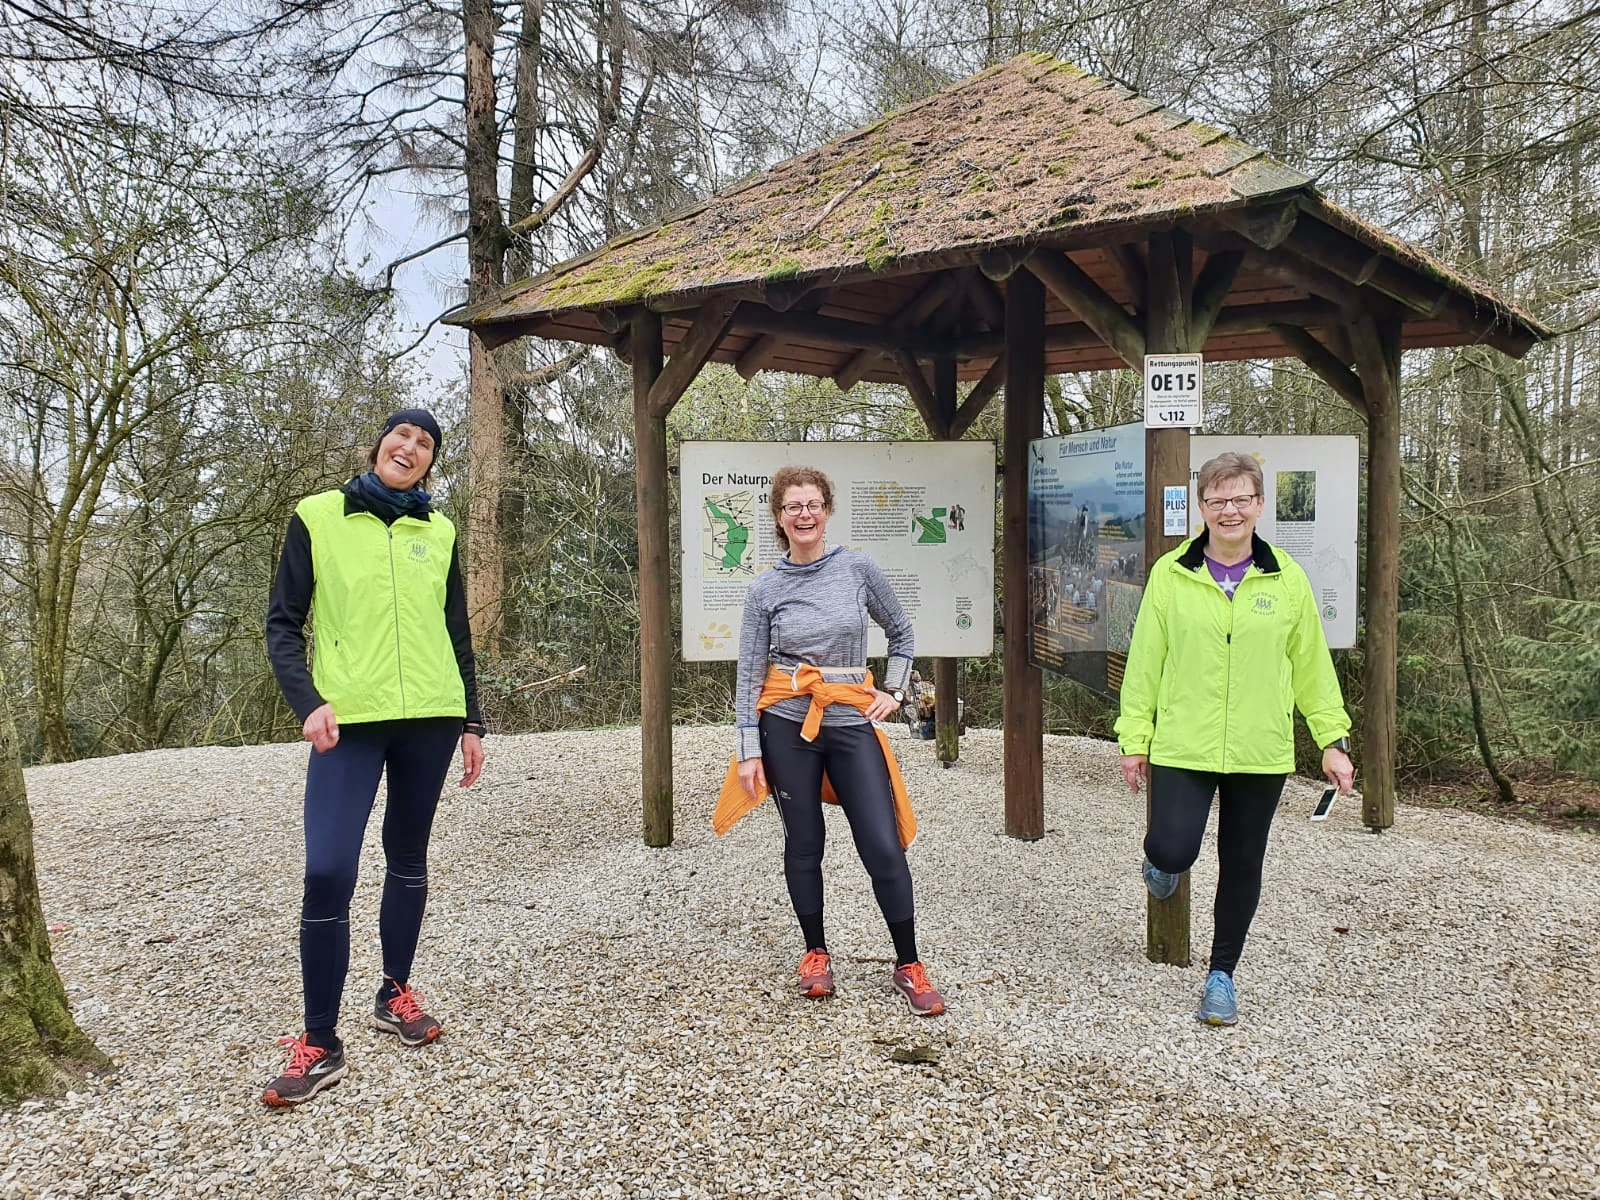 Oesterwinter-Suckow-Heide-13-Challenge-Toensberg-5RsRM